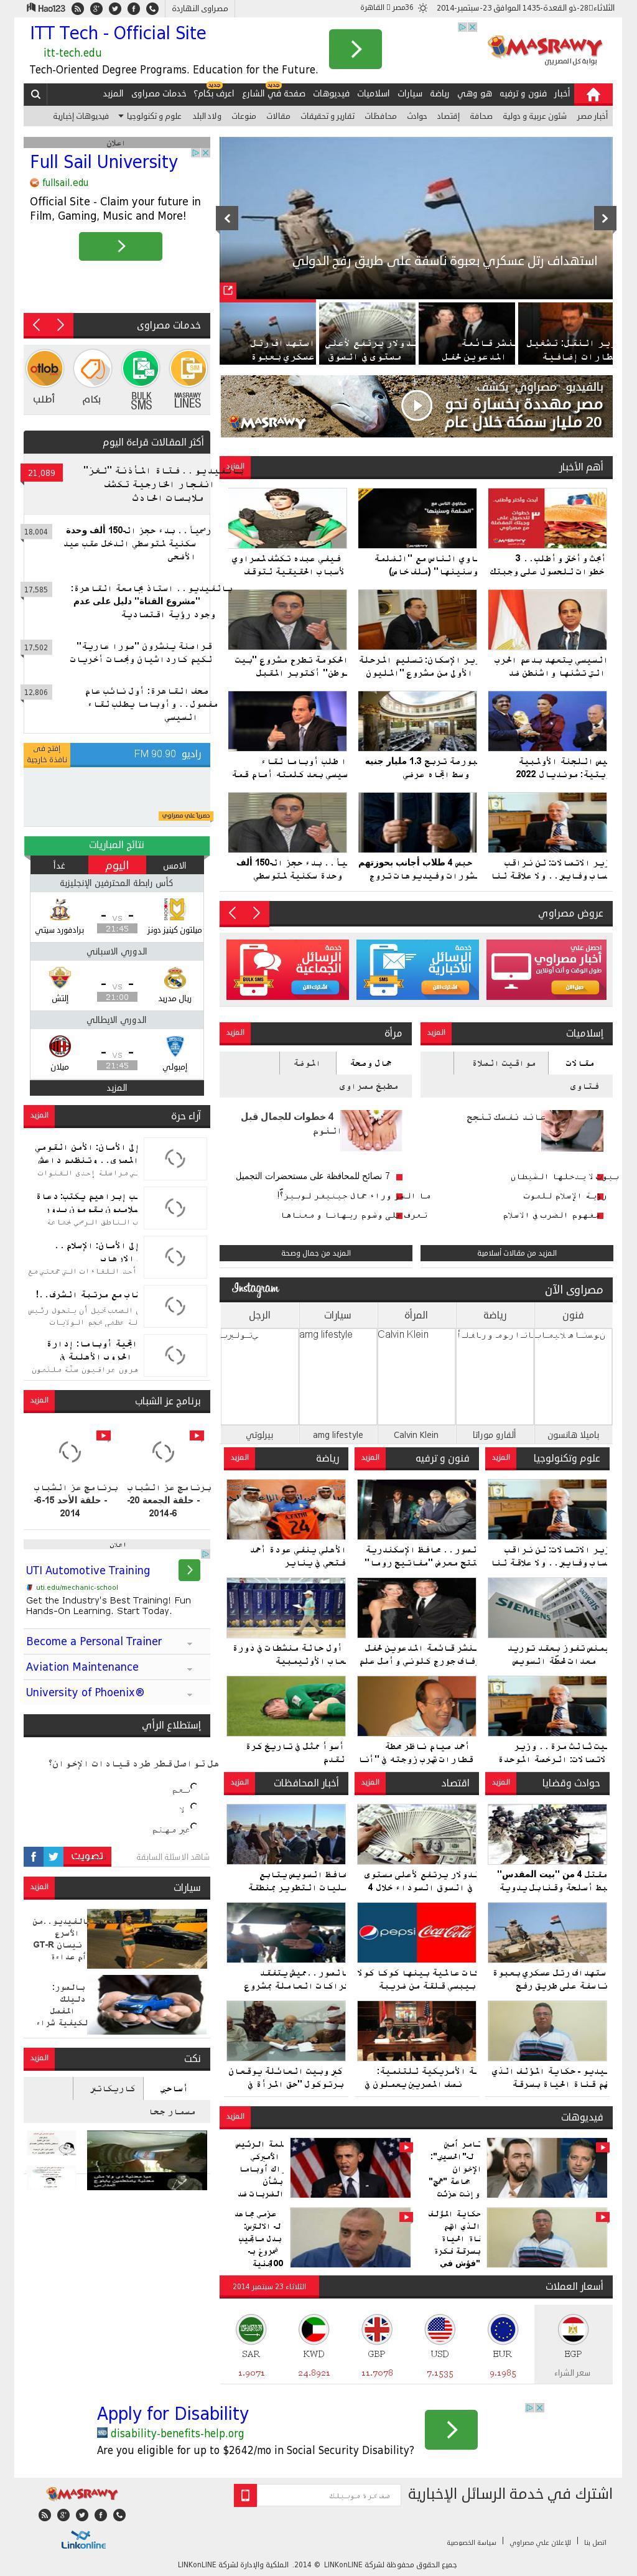 Masrawy at Tuesday Sept. 23, 2014, 4:11 p.m. UTC